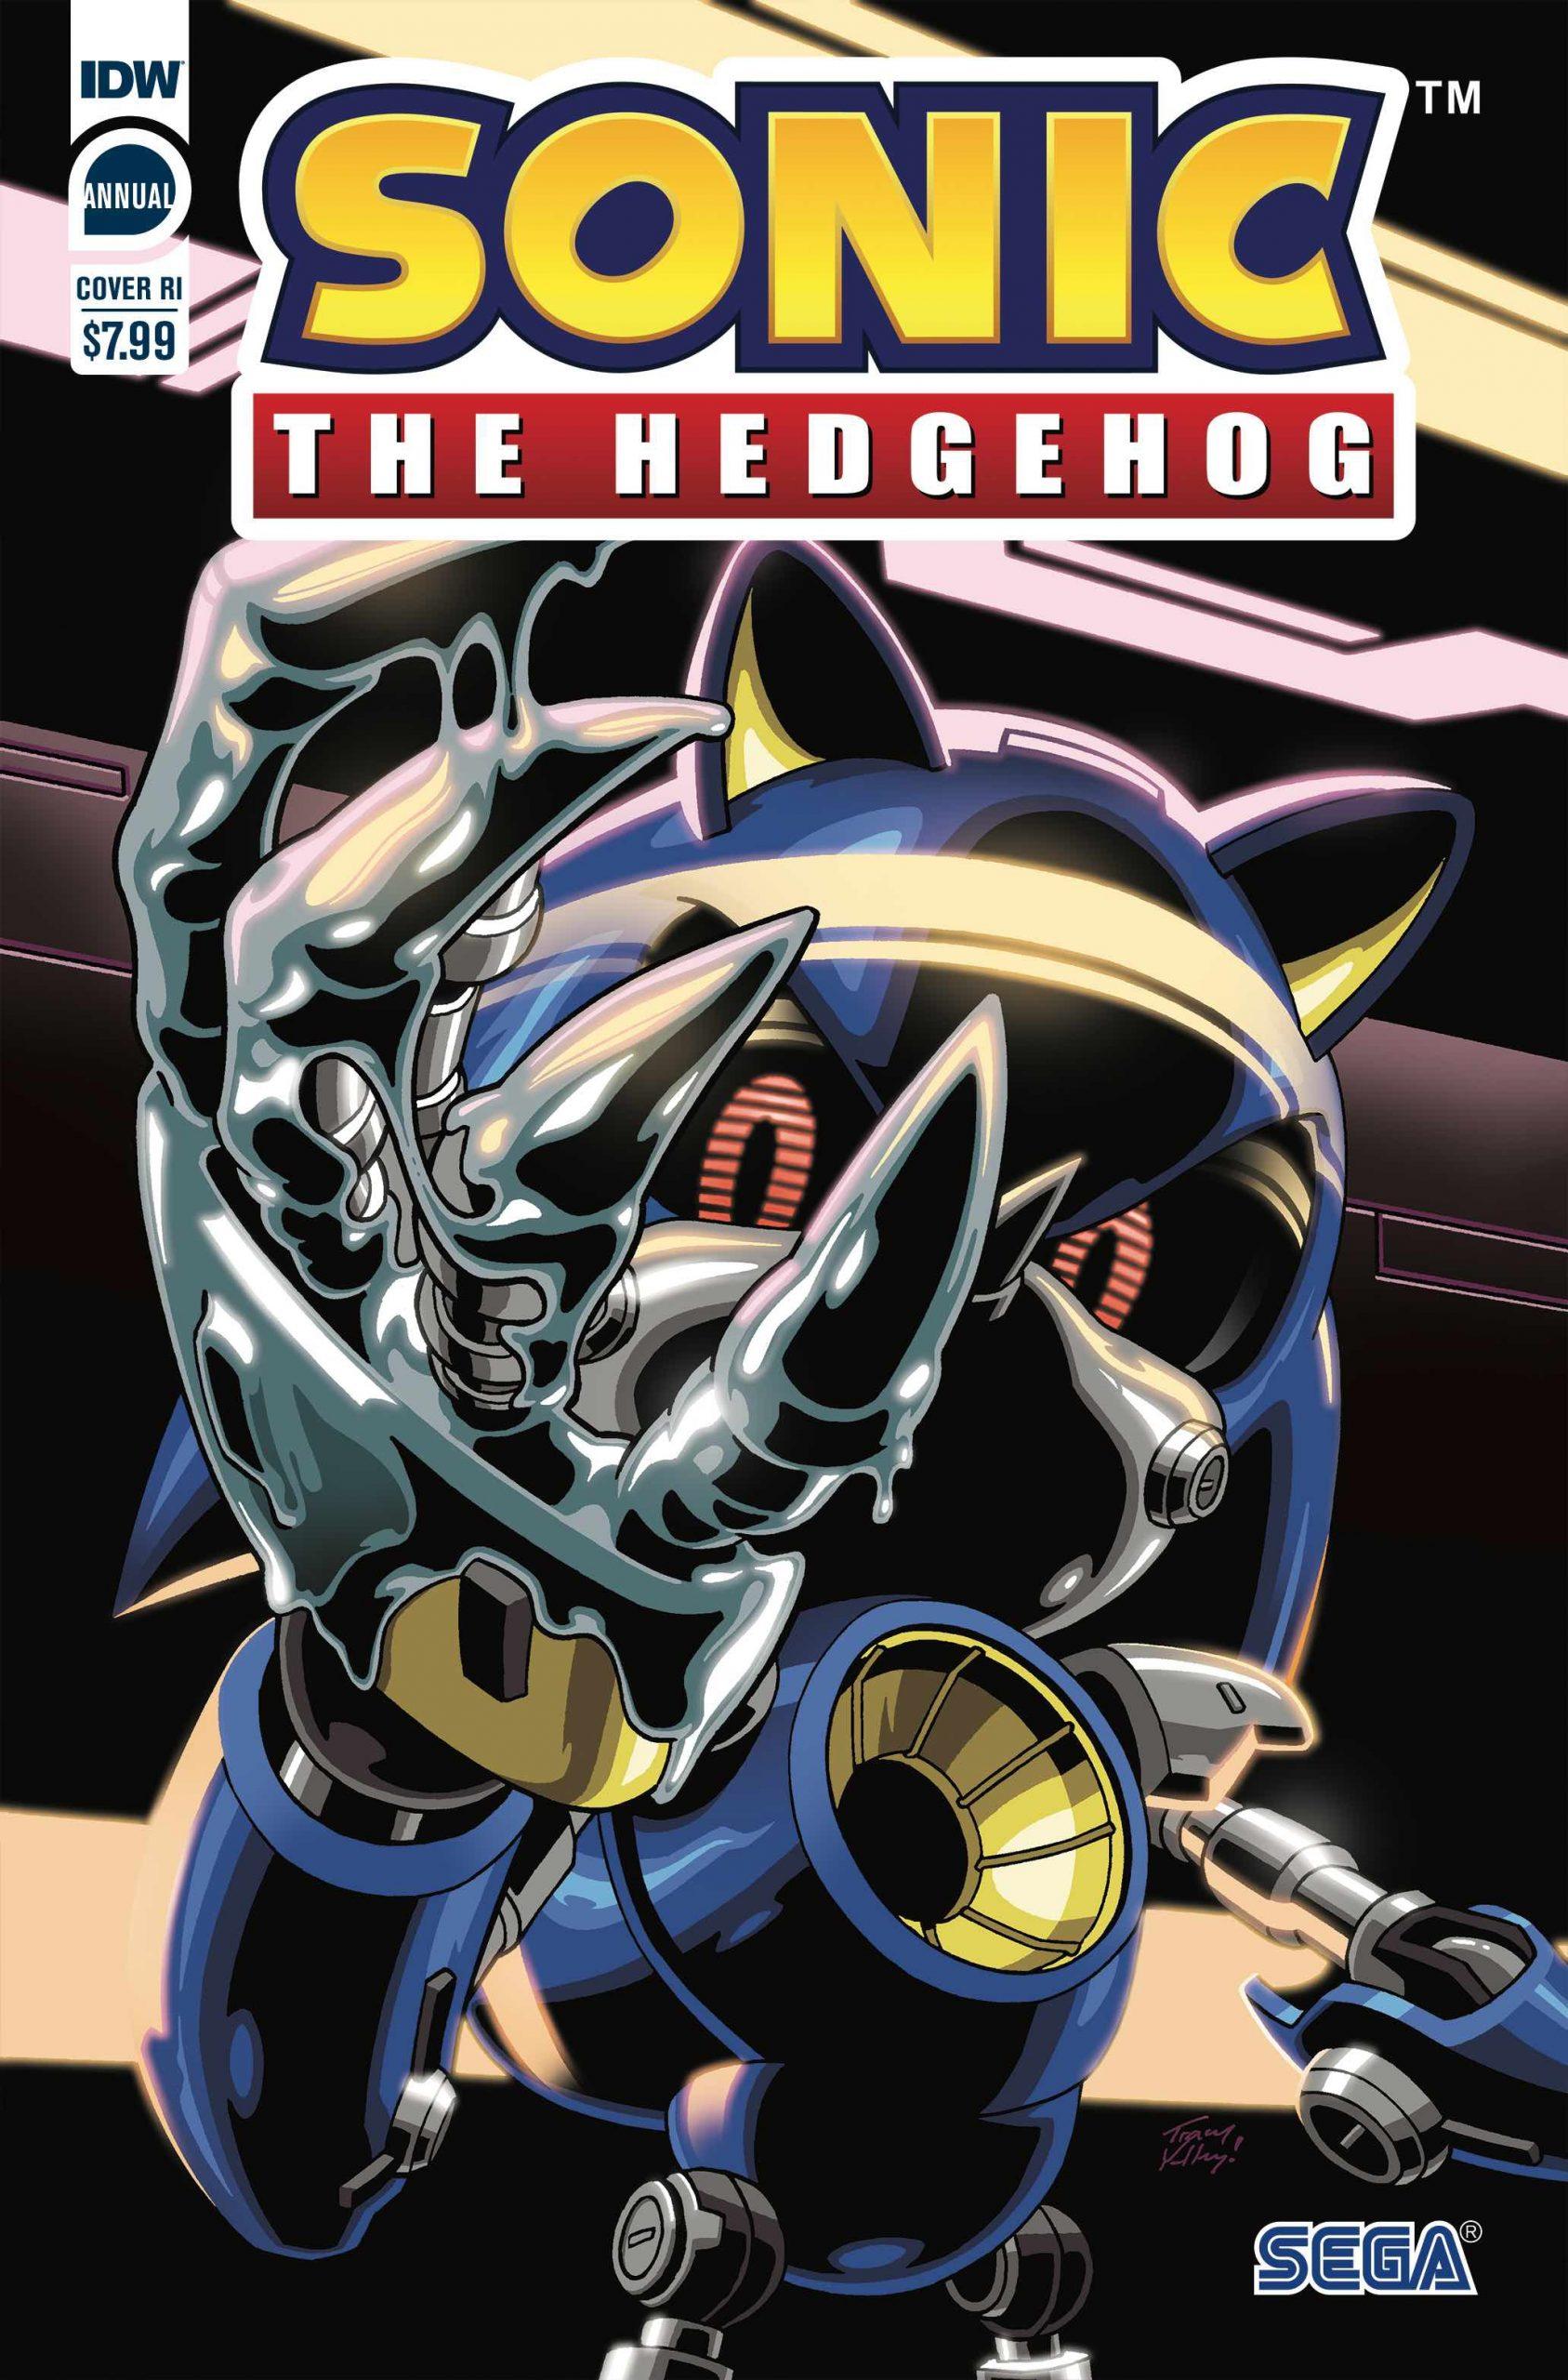 Sonic the Hedgehog Annual 2020 RI